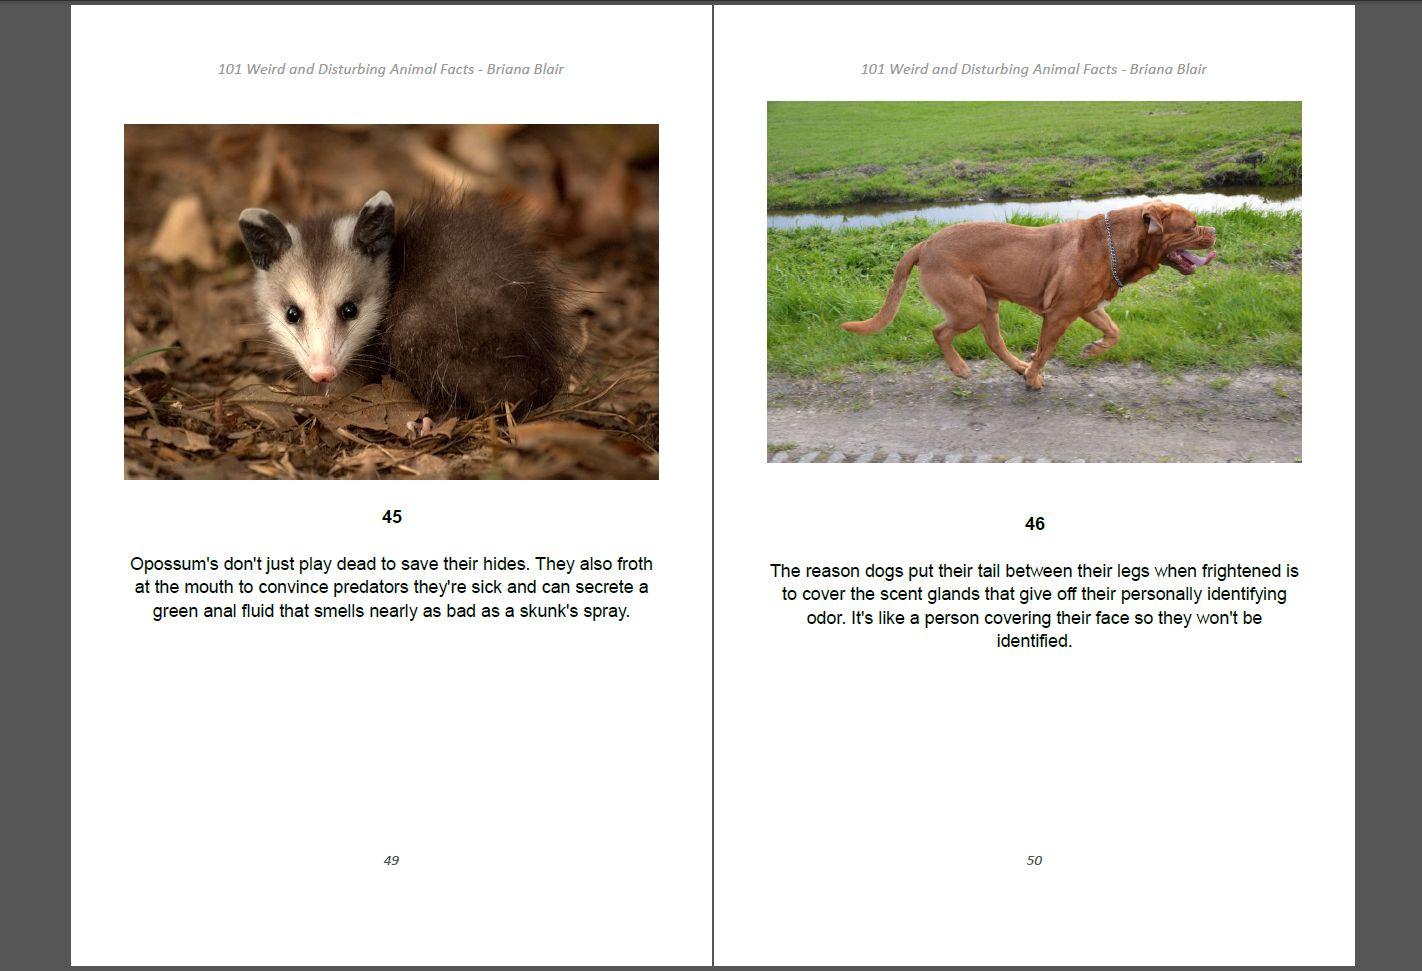 101 Weird and Disturbing Animal Facts by Briana Blair - Nature Ebook 3